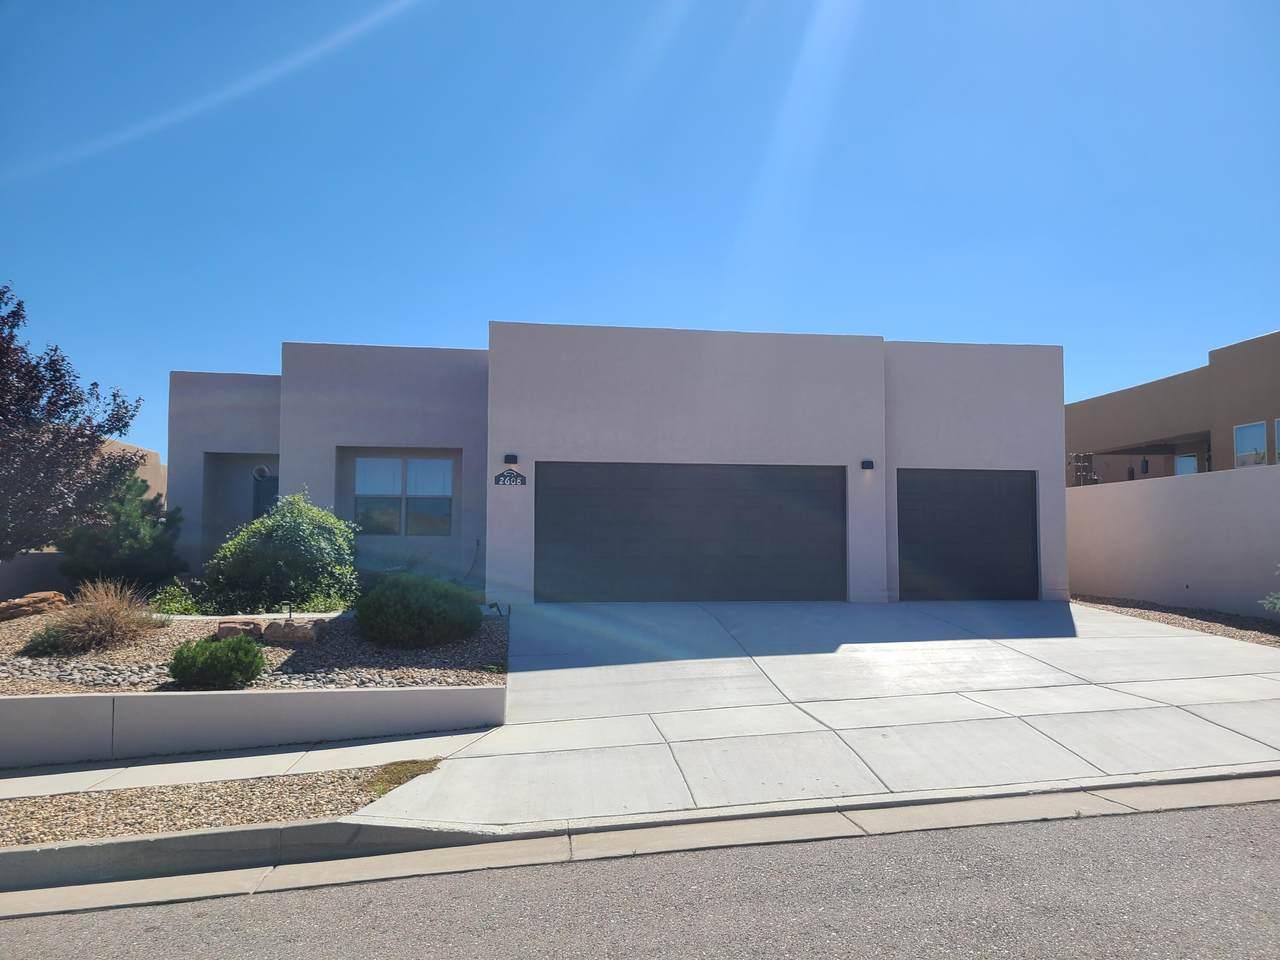 2608 Santa Fe Vista Road - Photo 1